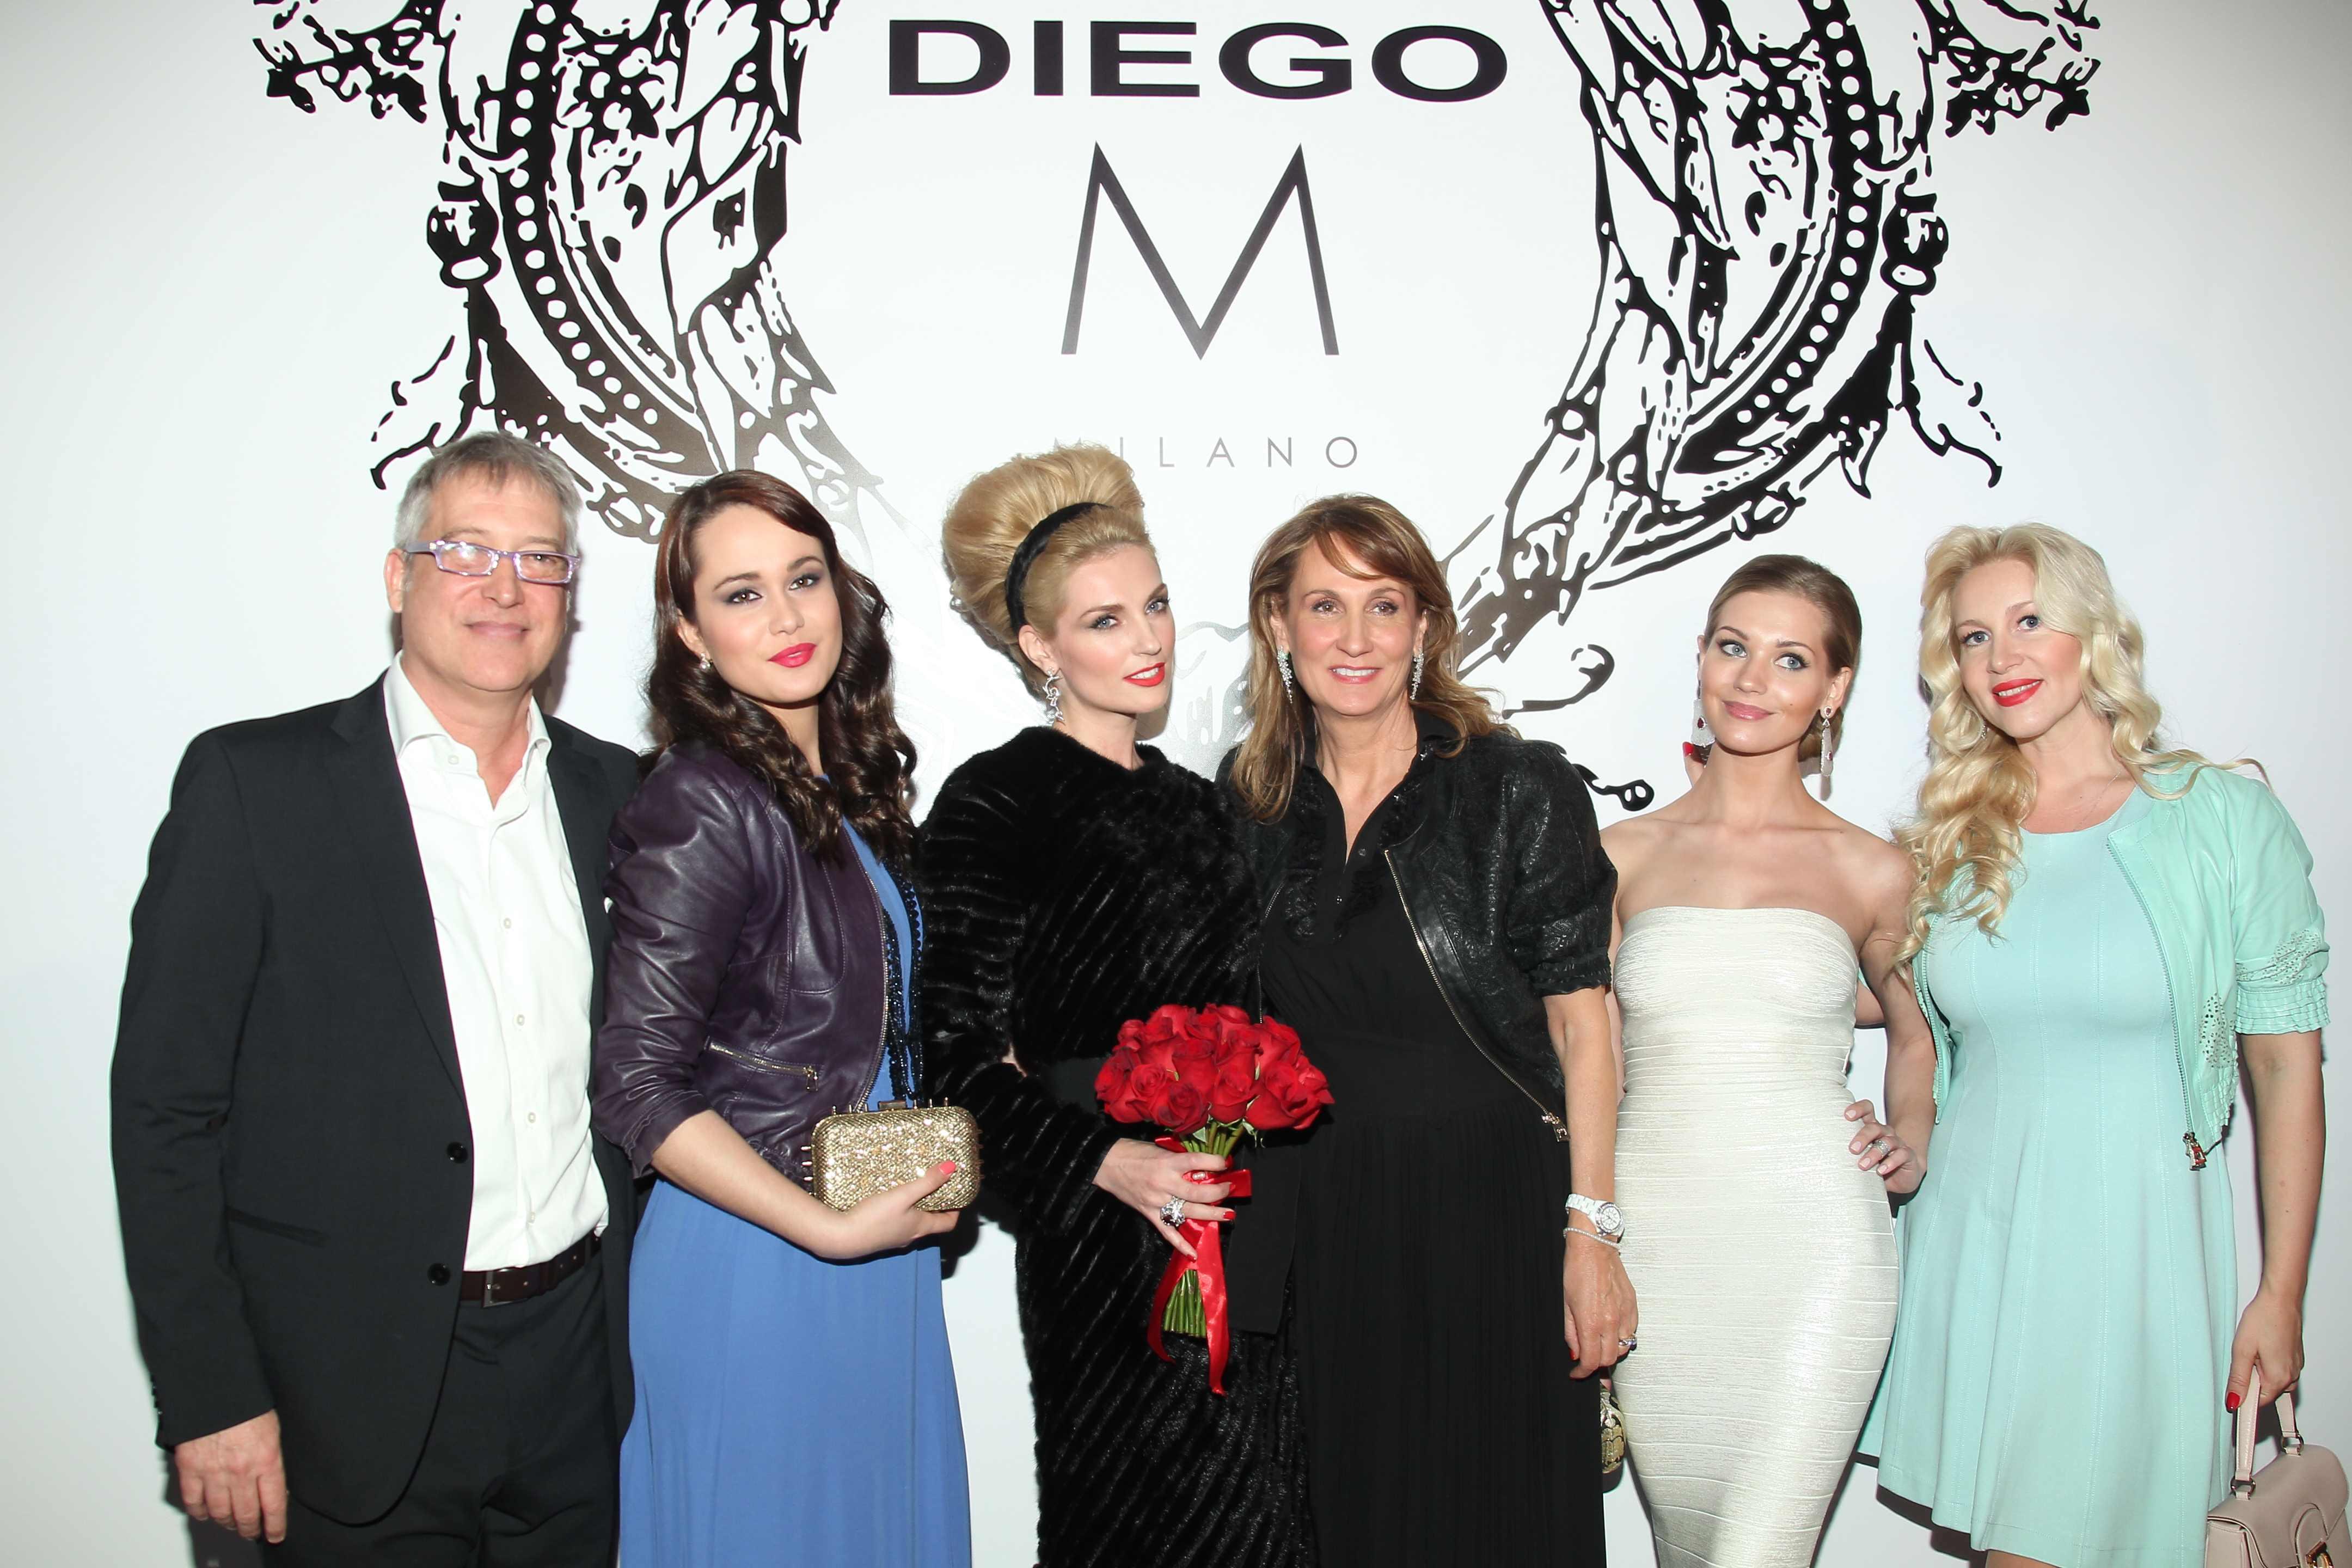 Diego Mazzi, Martha, Alexandra Savelieva, Manuela Bortolameolli, Kristina Asmus, Ekaterina Odintsova2